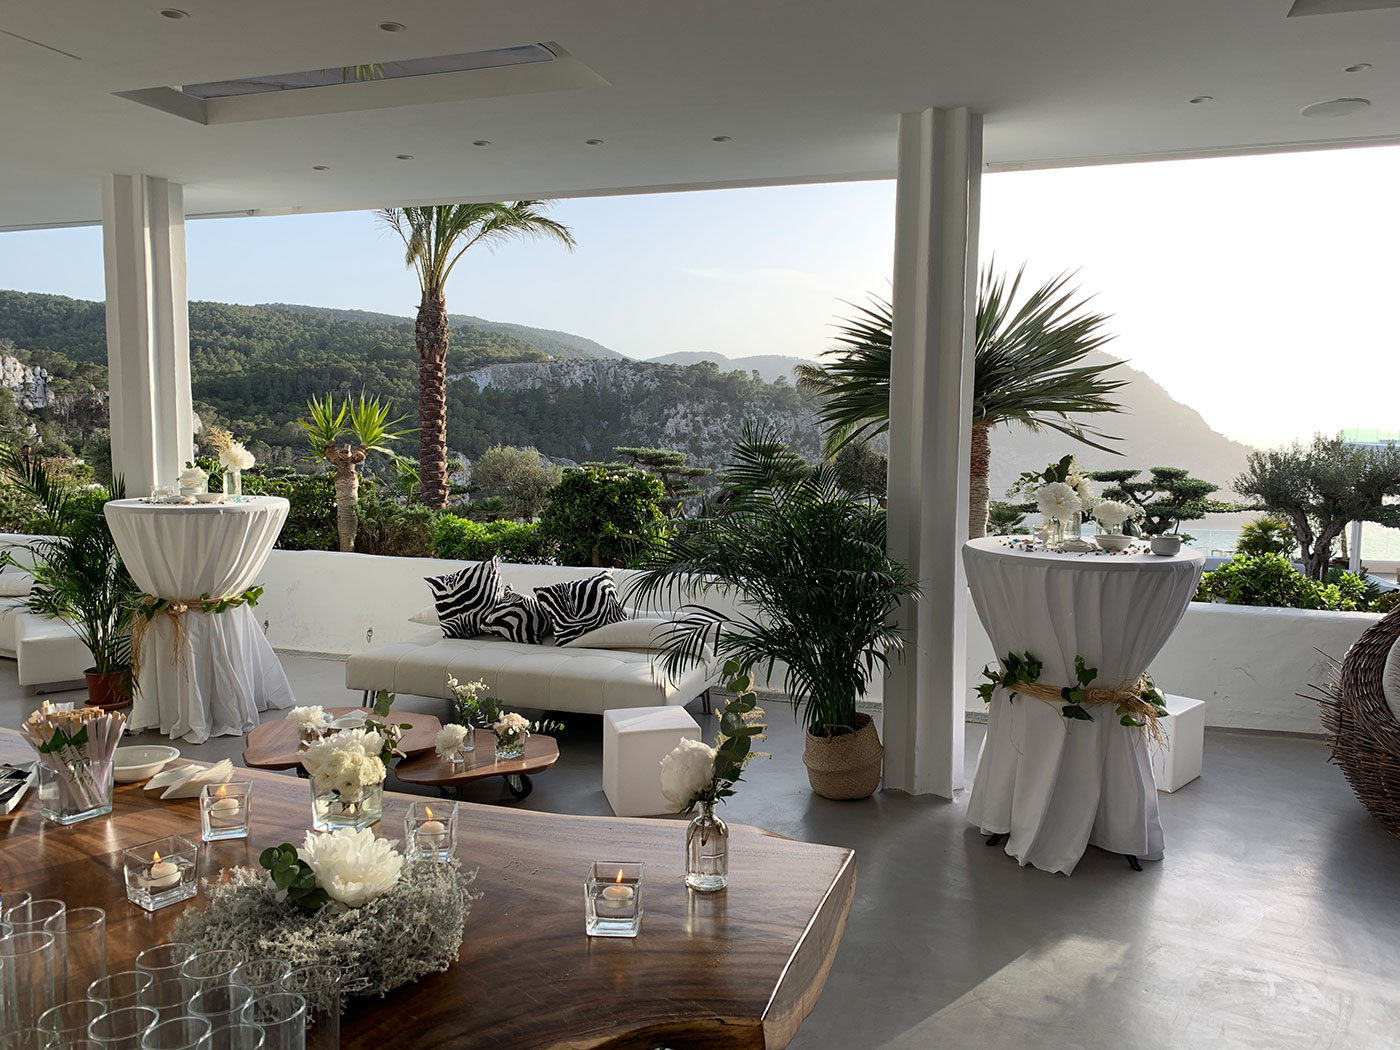 Hacienda Na Xamena Wedding Venue